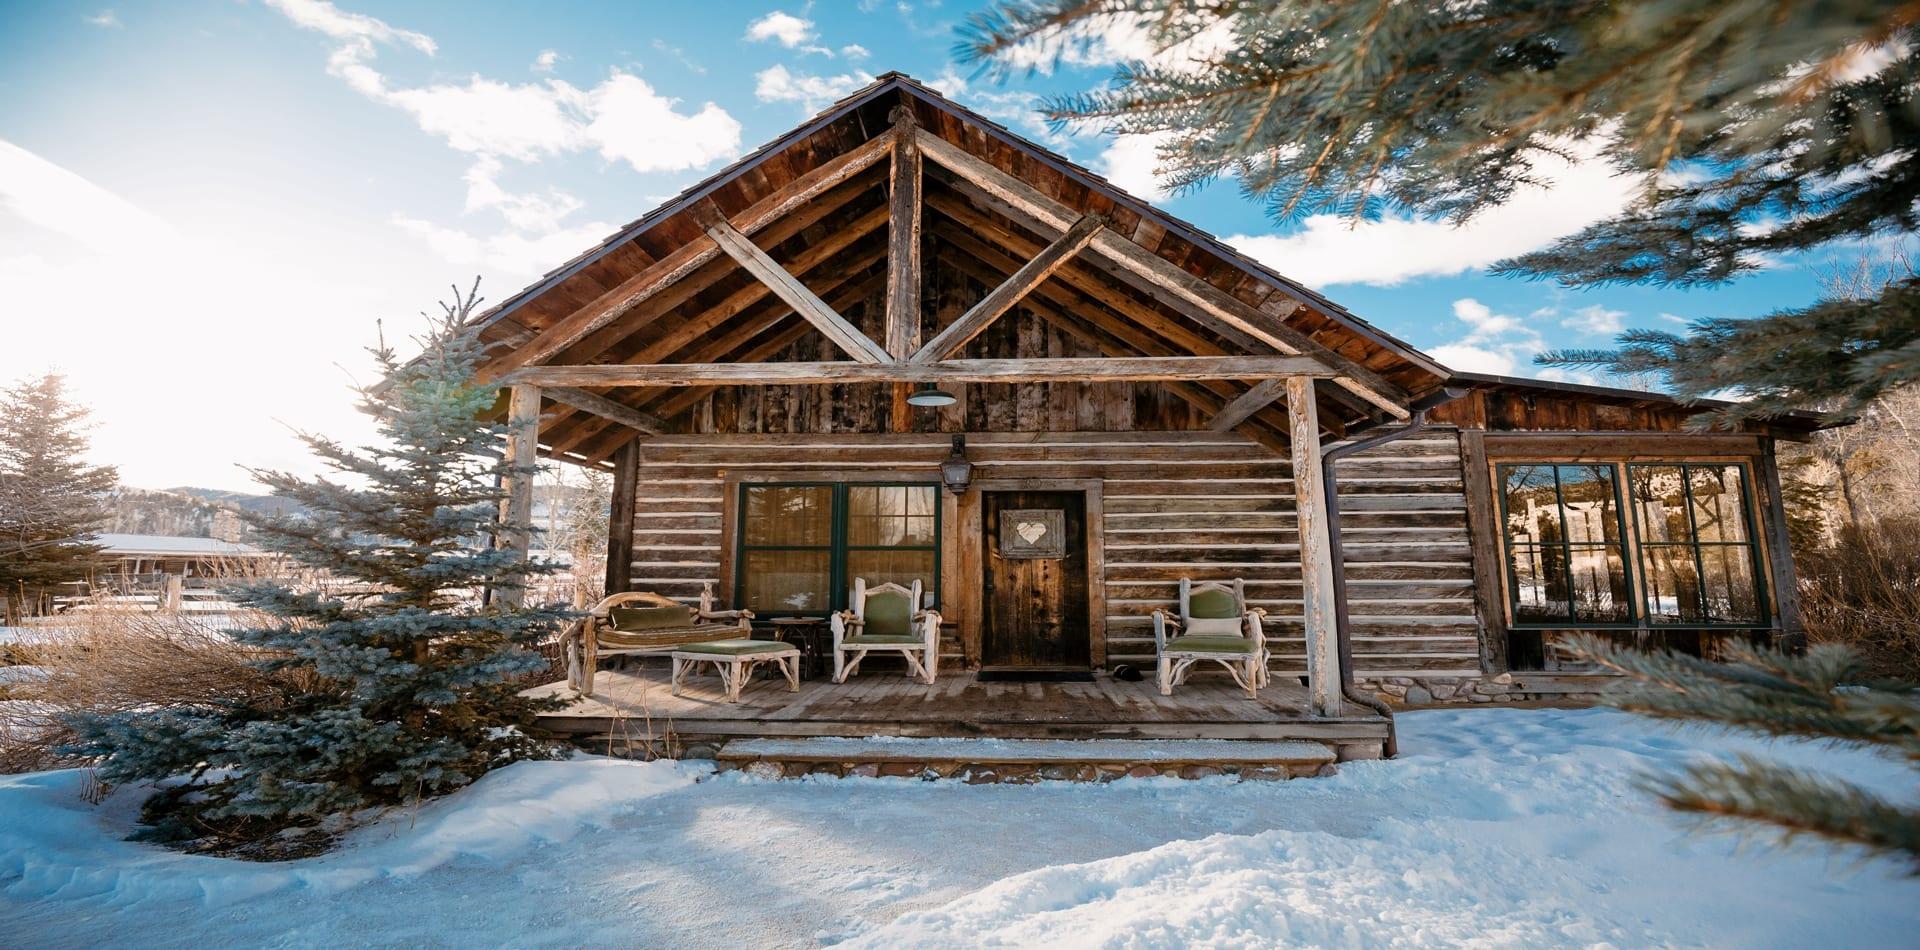 HERO Montana The Ranch at Rock Creek Exterior